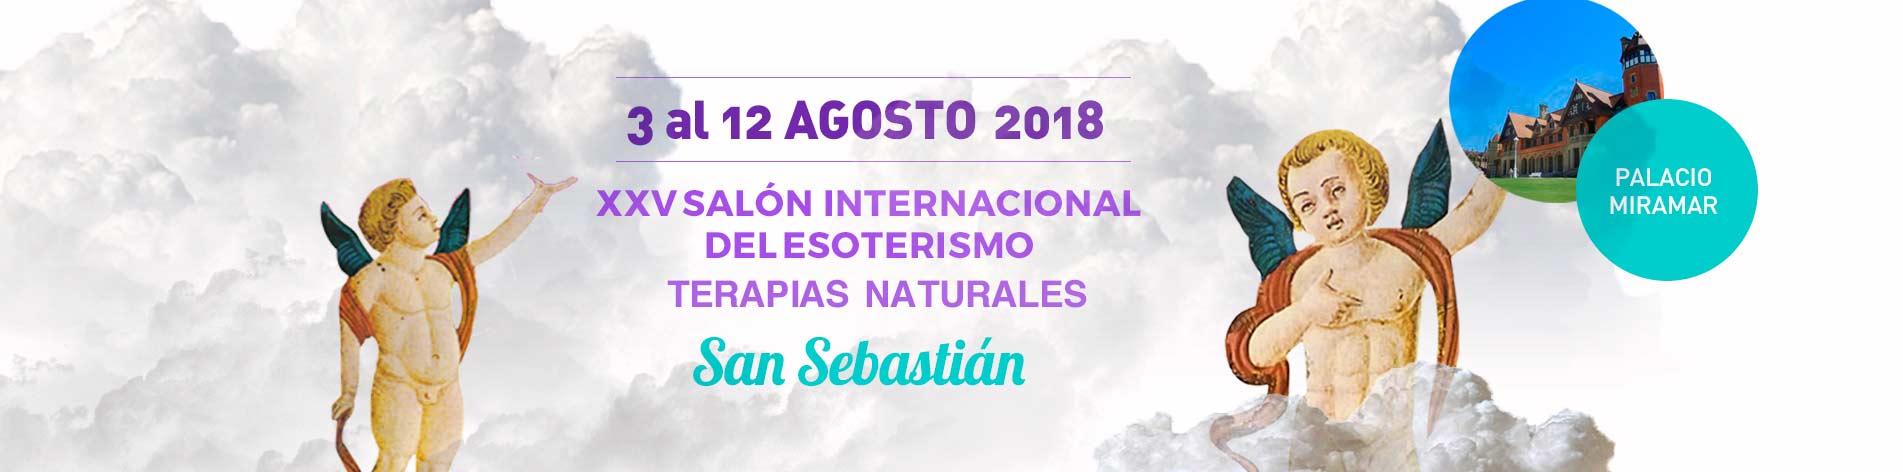 Foro Ciencias Espirituales San Sebastian y Madrid